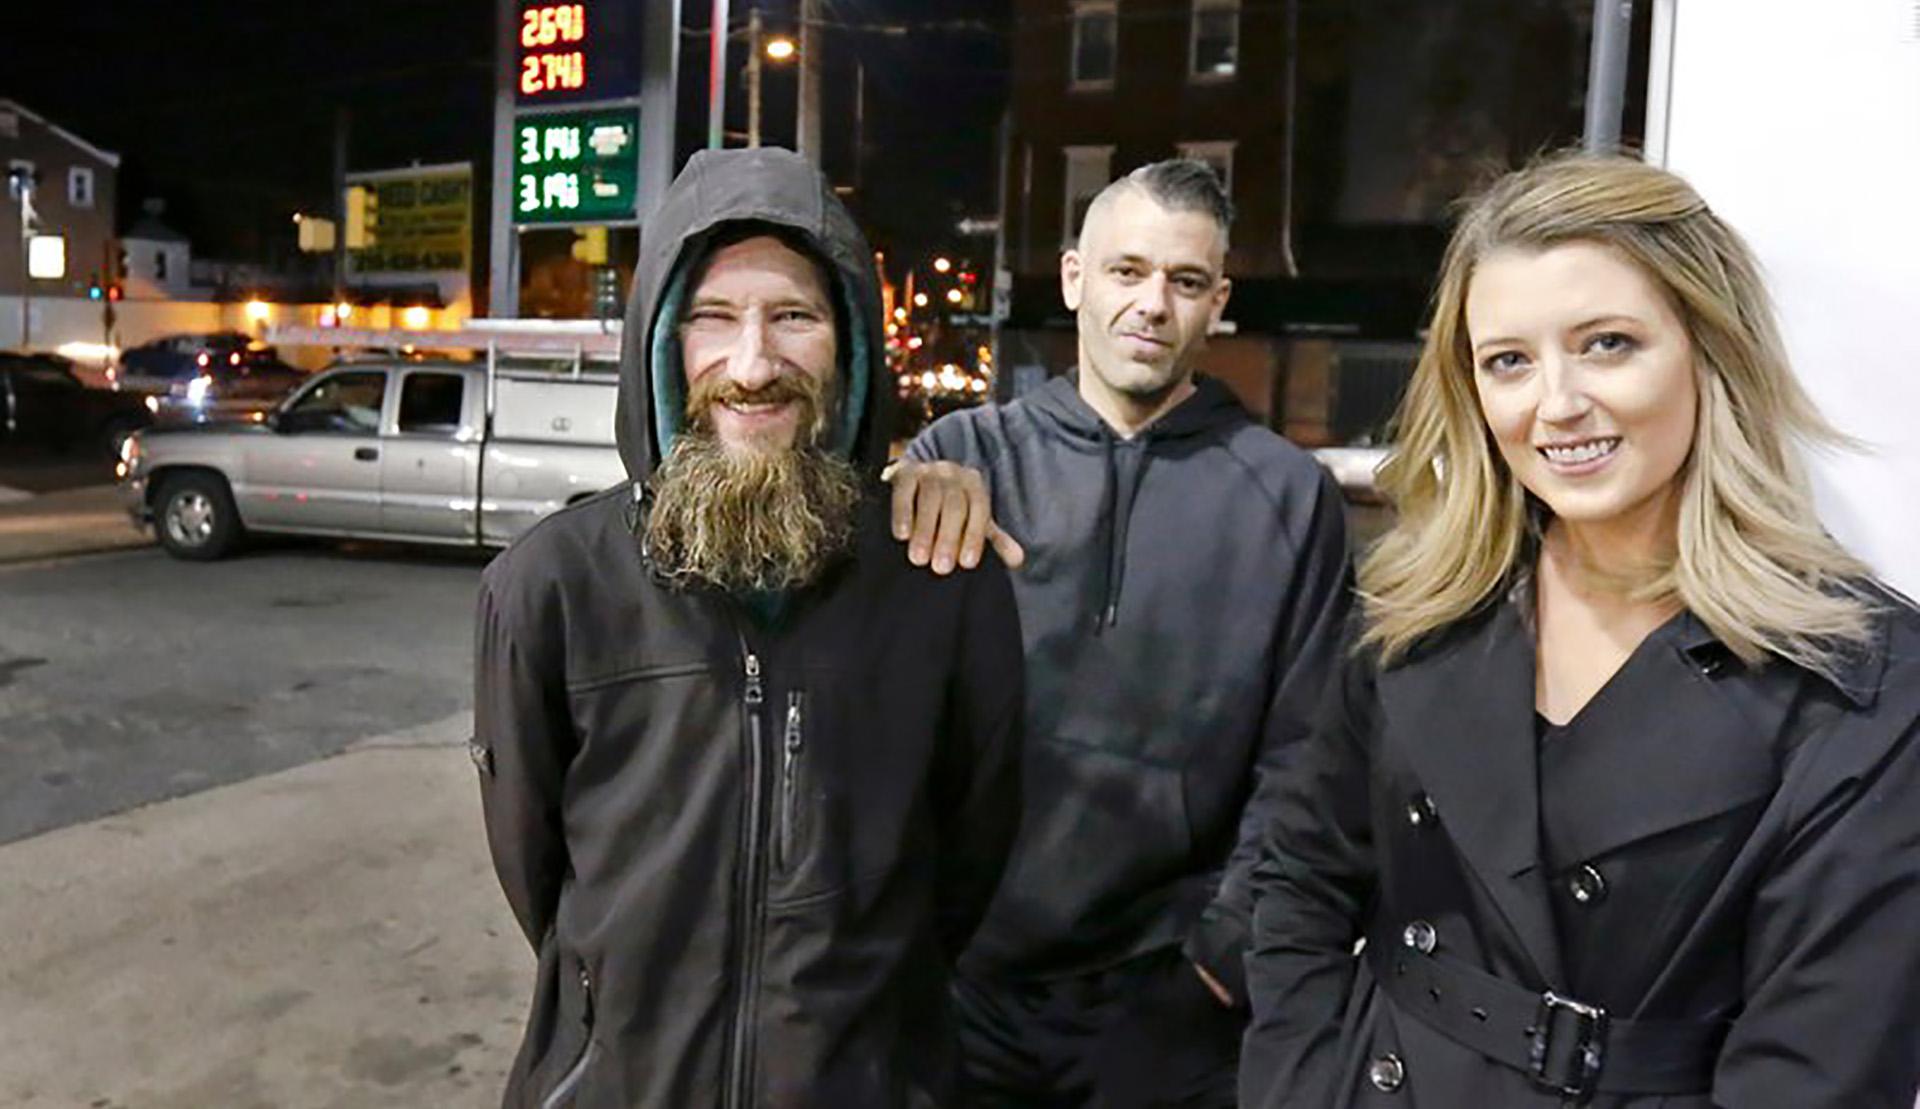 Homeless Couple scam_1542313408243.jpeg.jpg